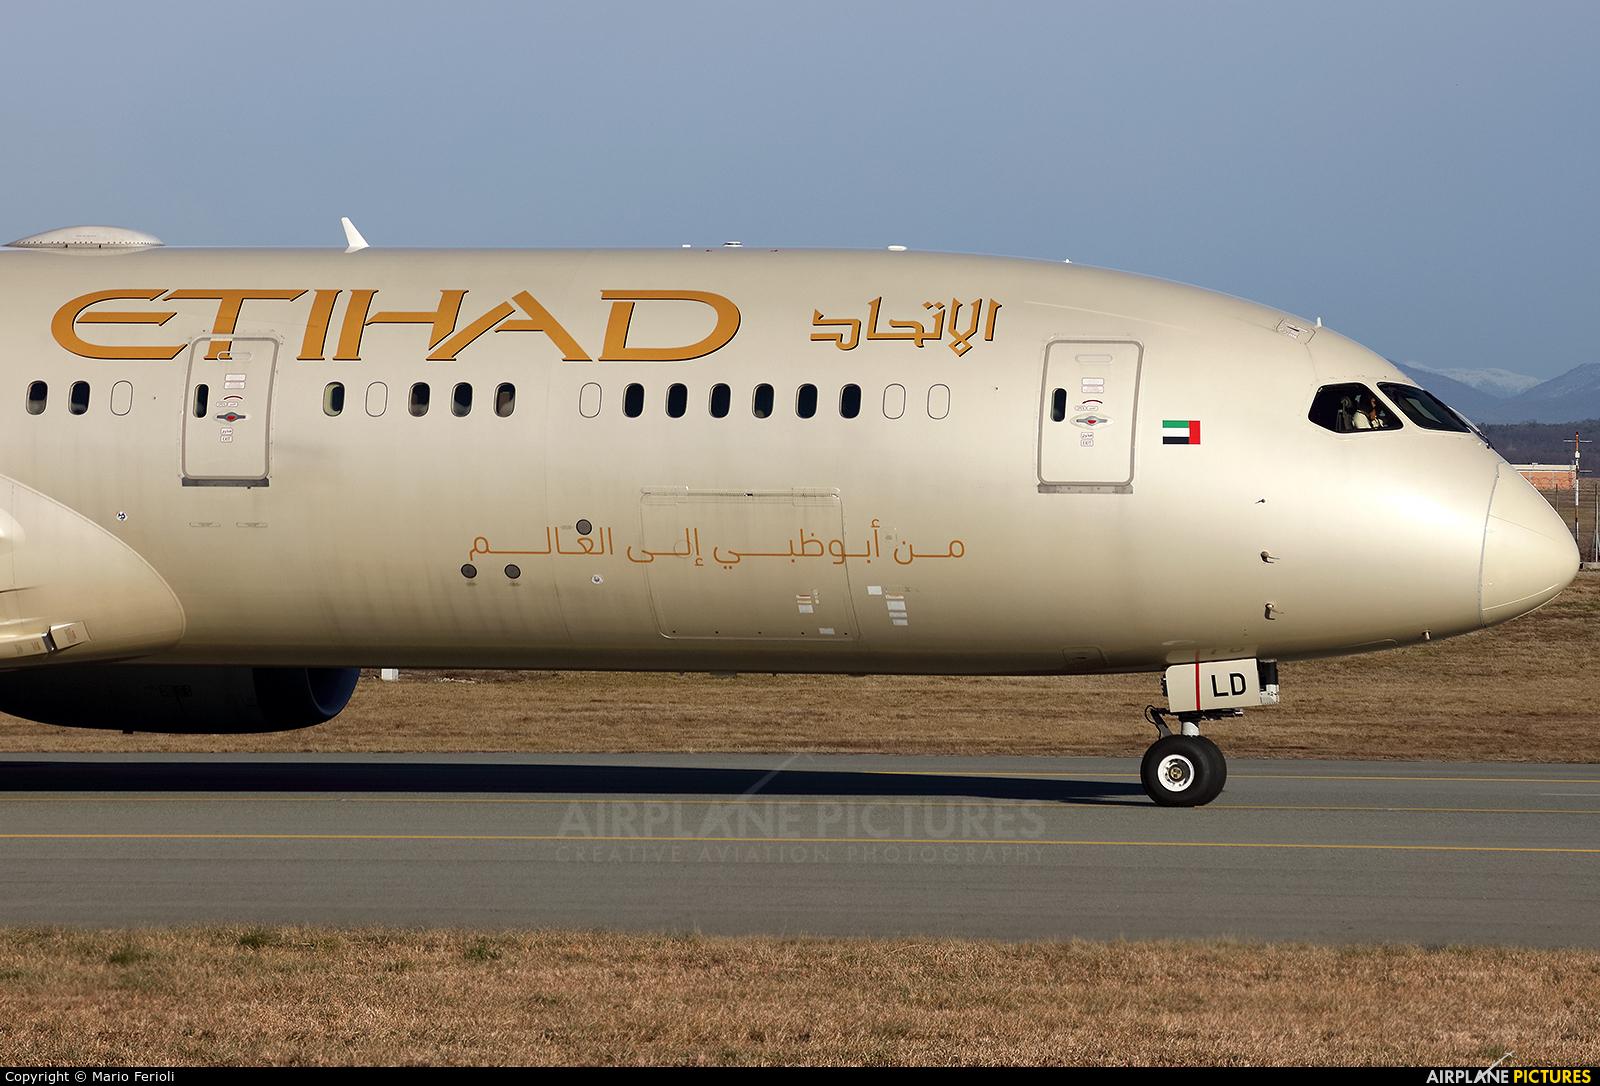 Etihad Airways A6-BLD aircraft at Milan - Malpensa